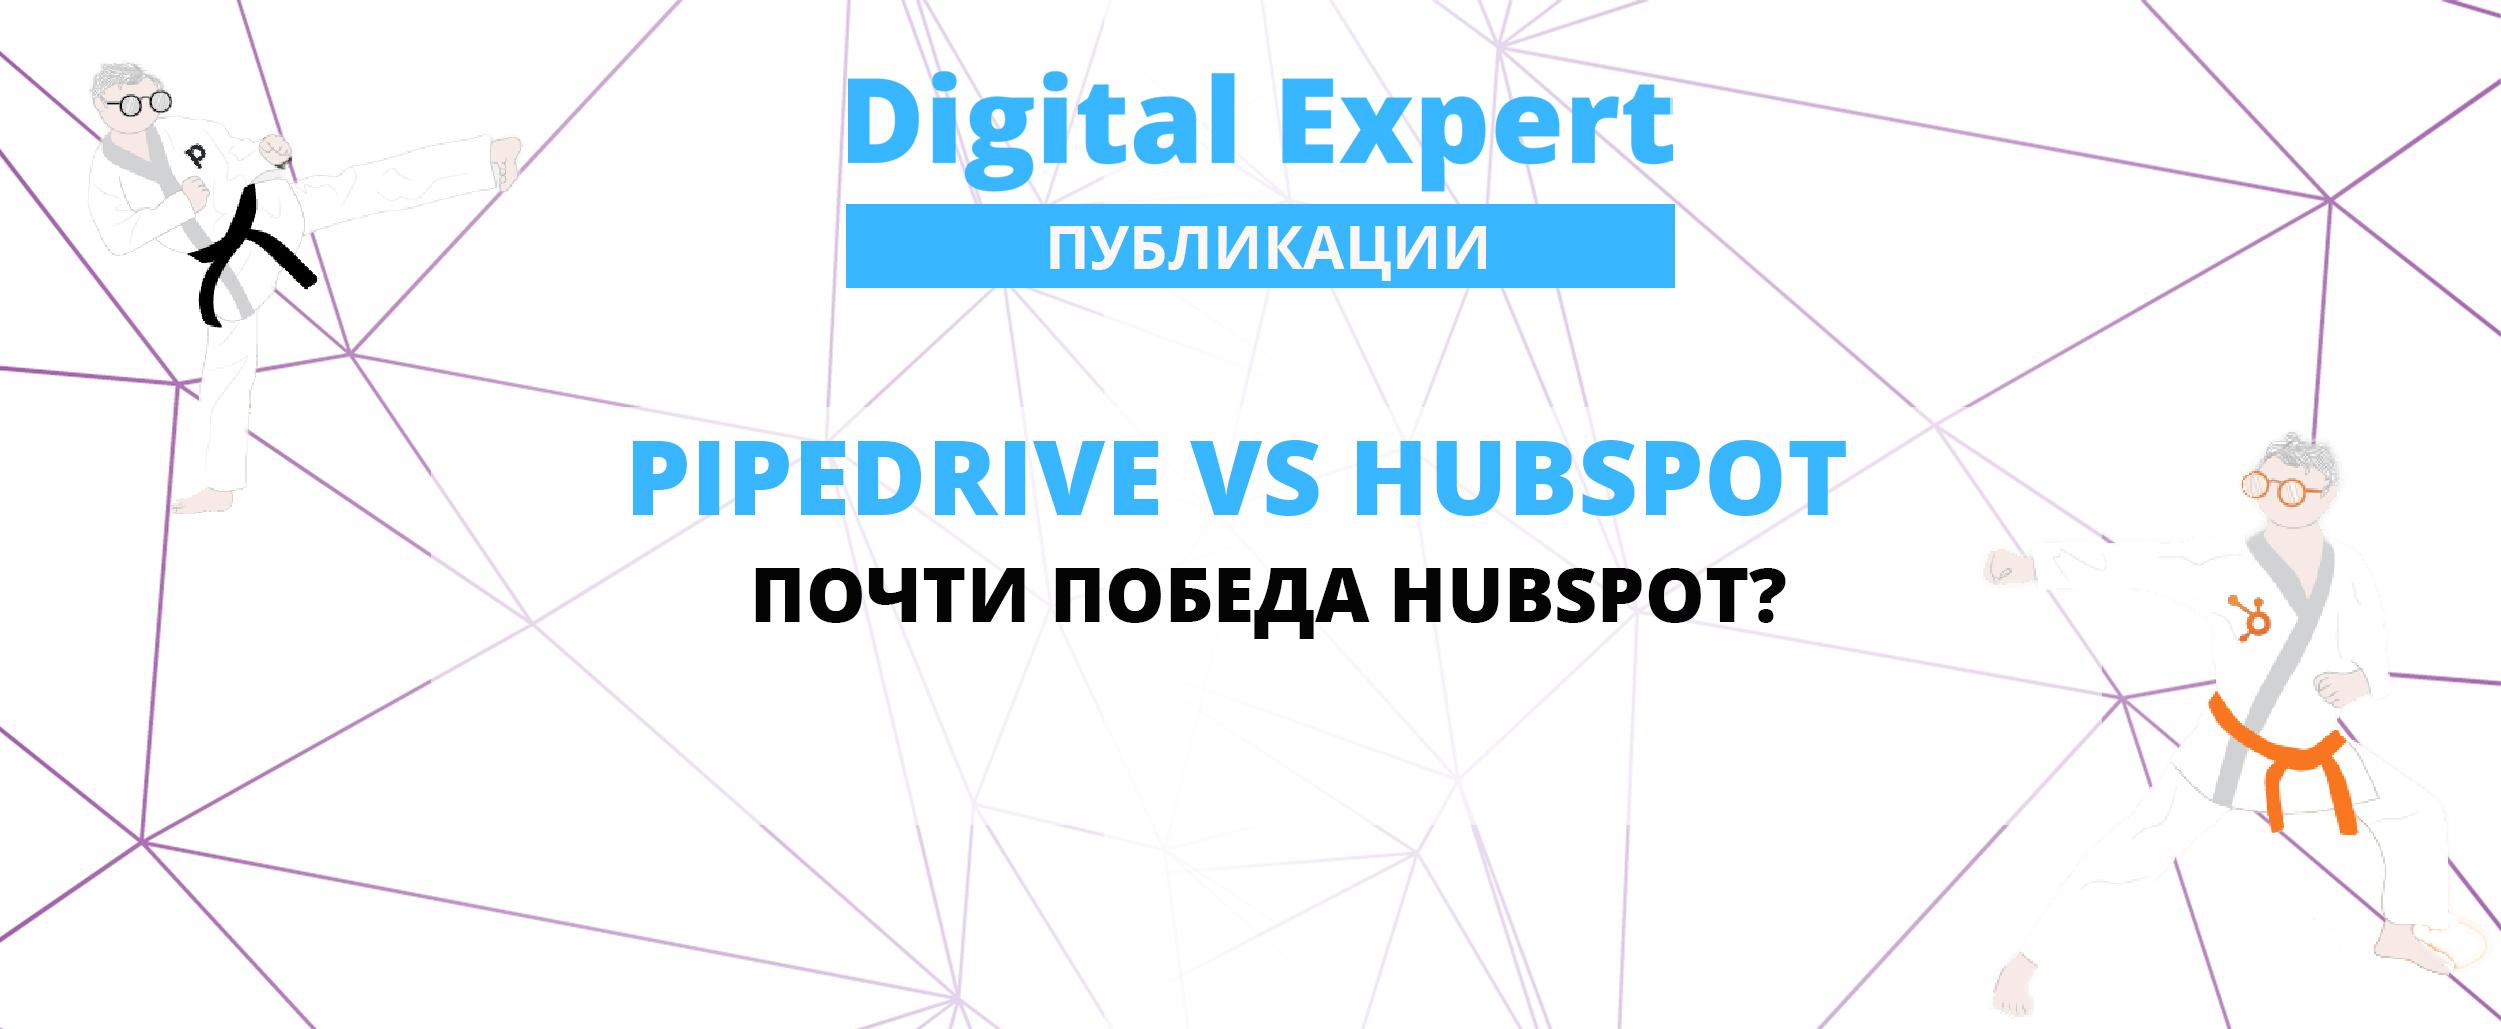 Pipedrive vs HubSpot: является ли Pipedrive достойной альтернативой HubSpot?